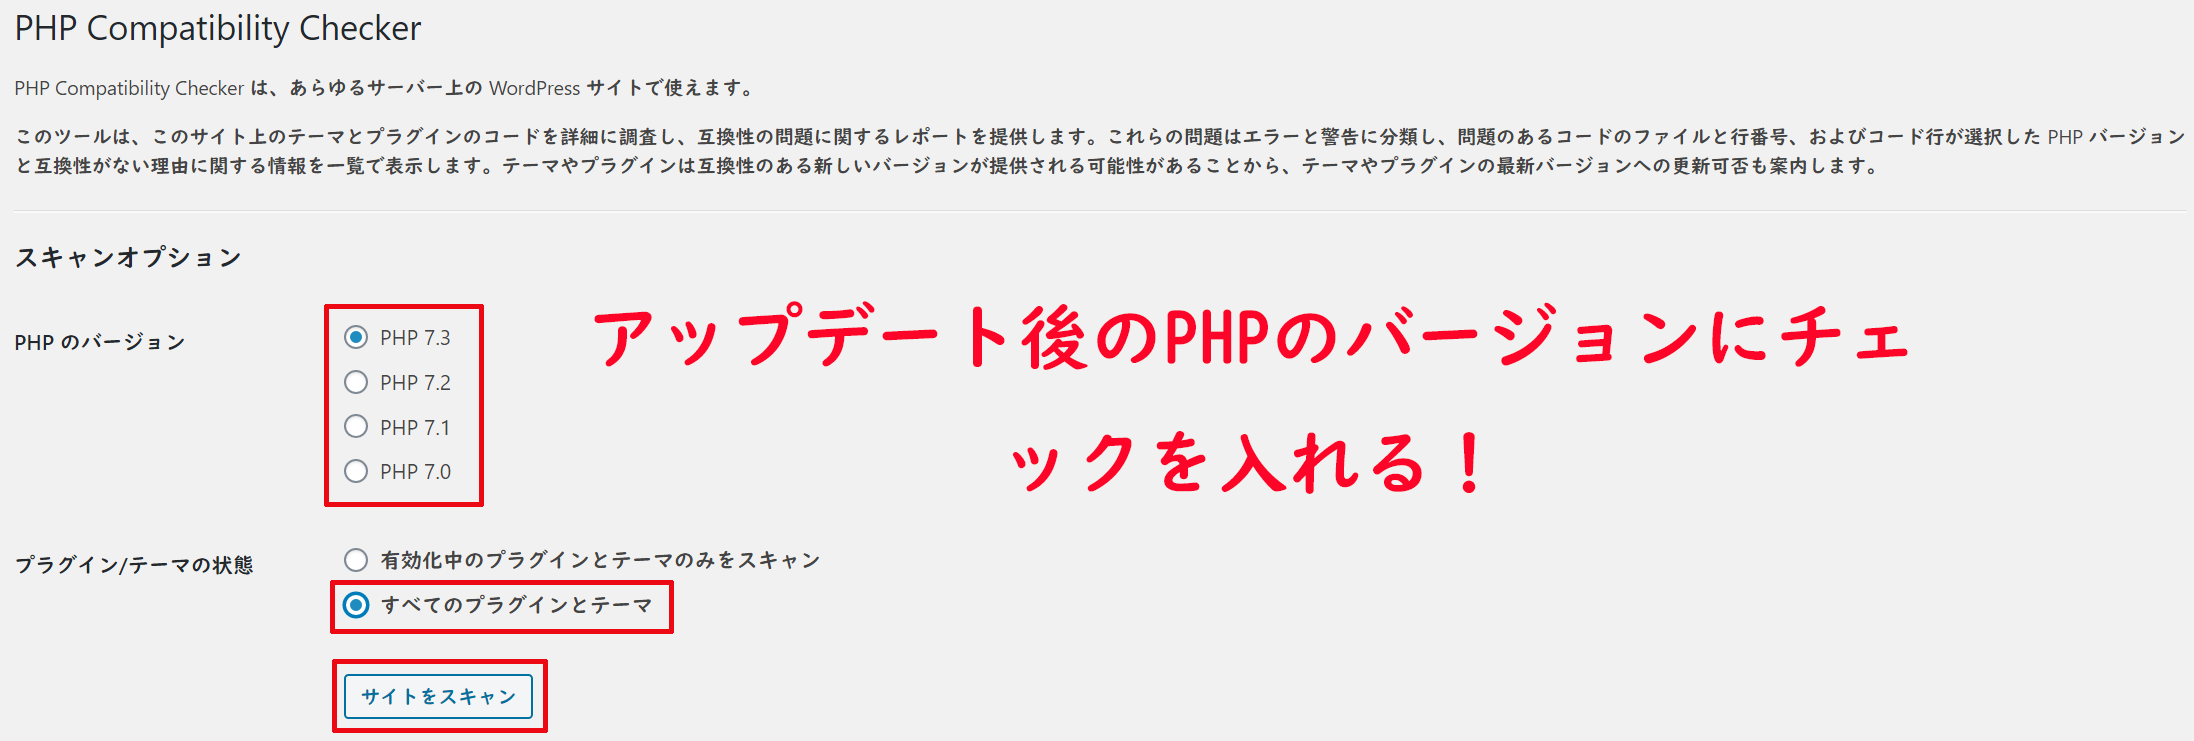 PHP 7.3とすべてのプラグインとテーマにチェックを入れ、サイトをスキャンをクリックする